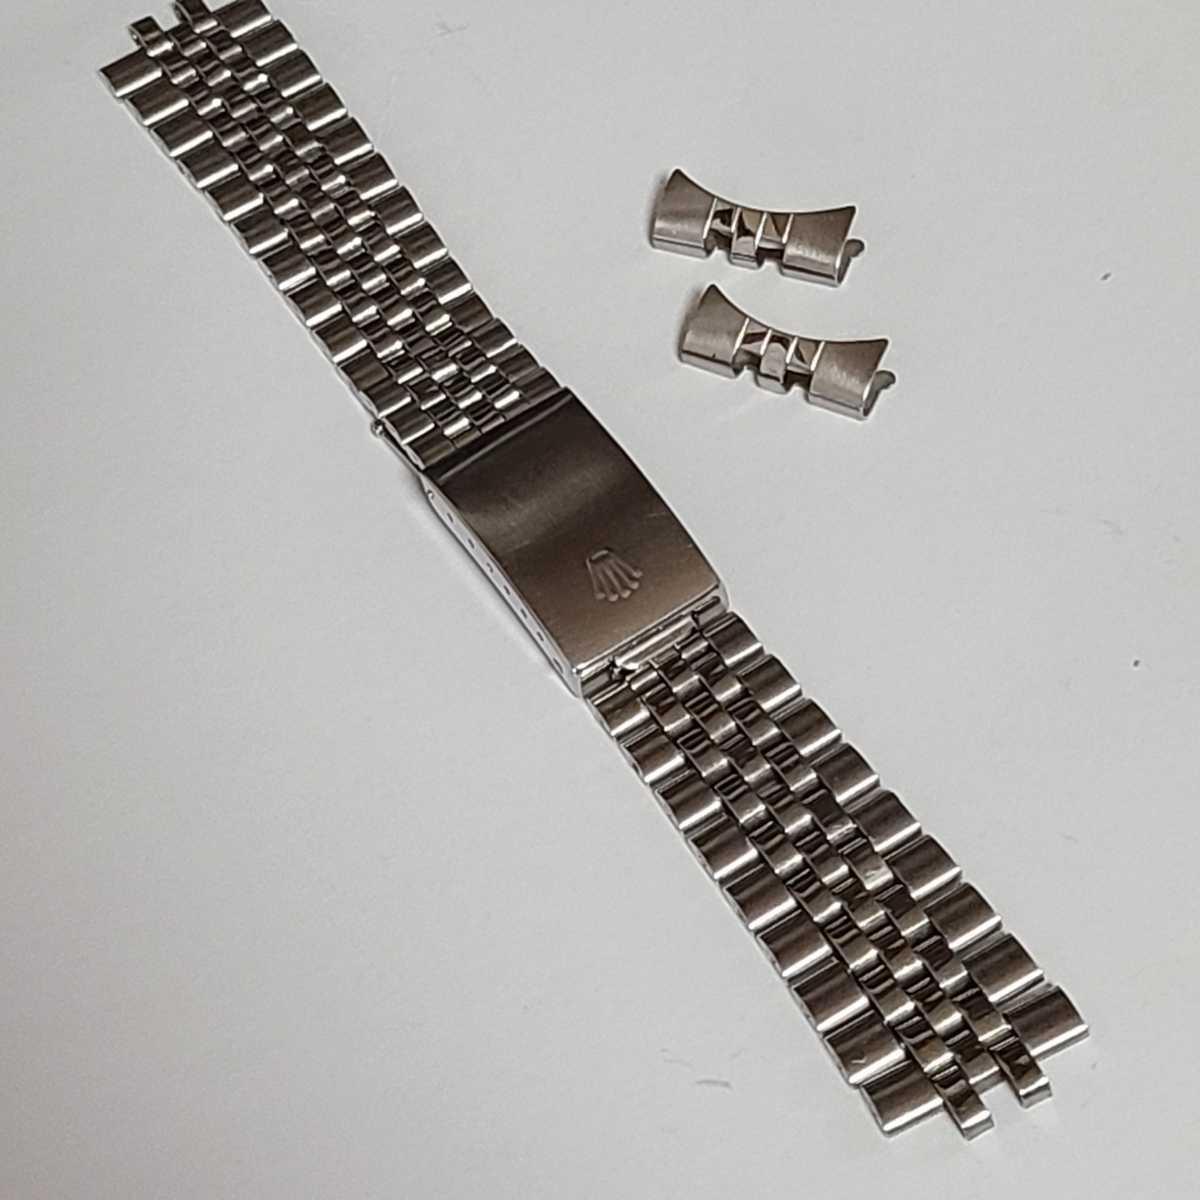 ROLEX ロレックス 純正ジュビリー巻きブレス 62510H S8 ラグ幅20mm FF55